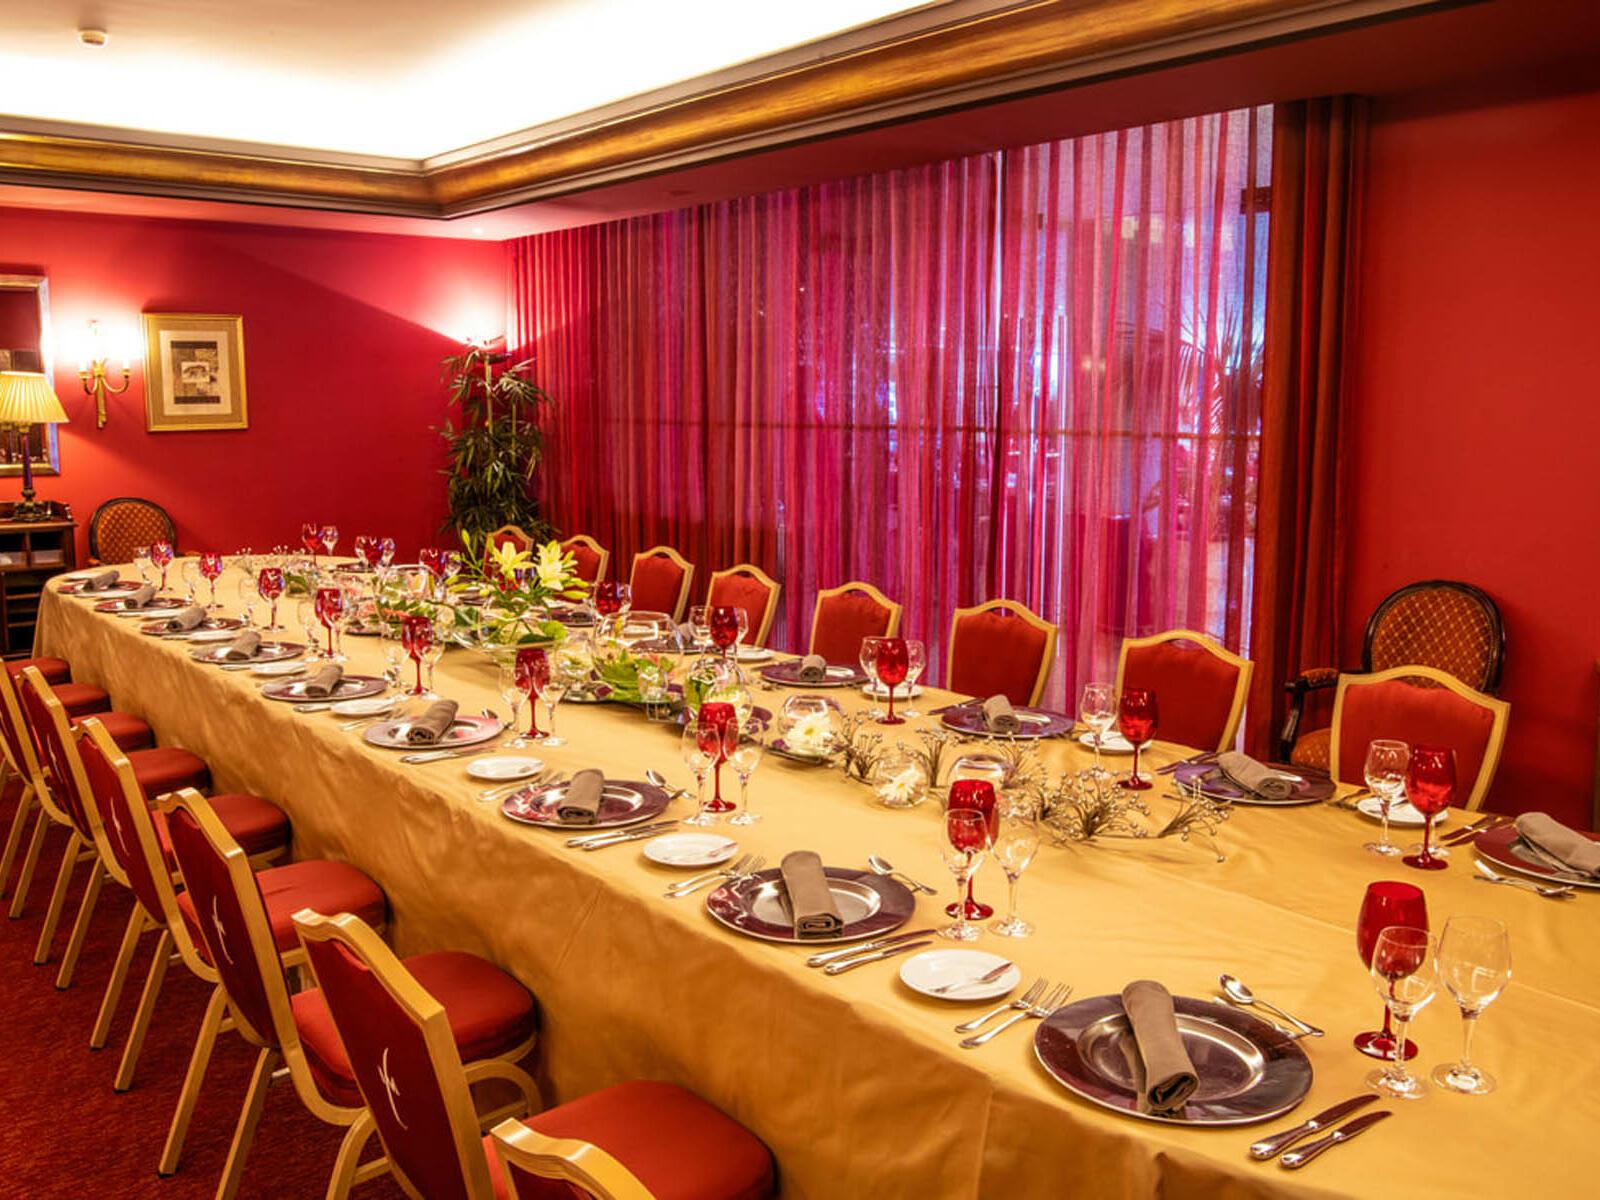 Perfectly arranged Estoril Dining Room at Hotel Cascais Miragem